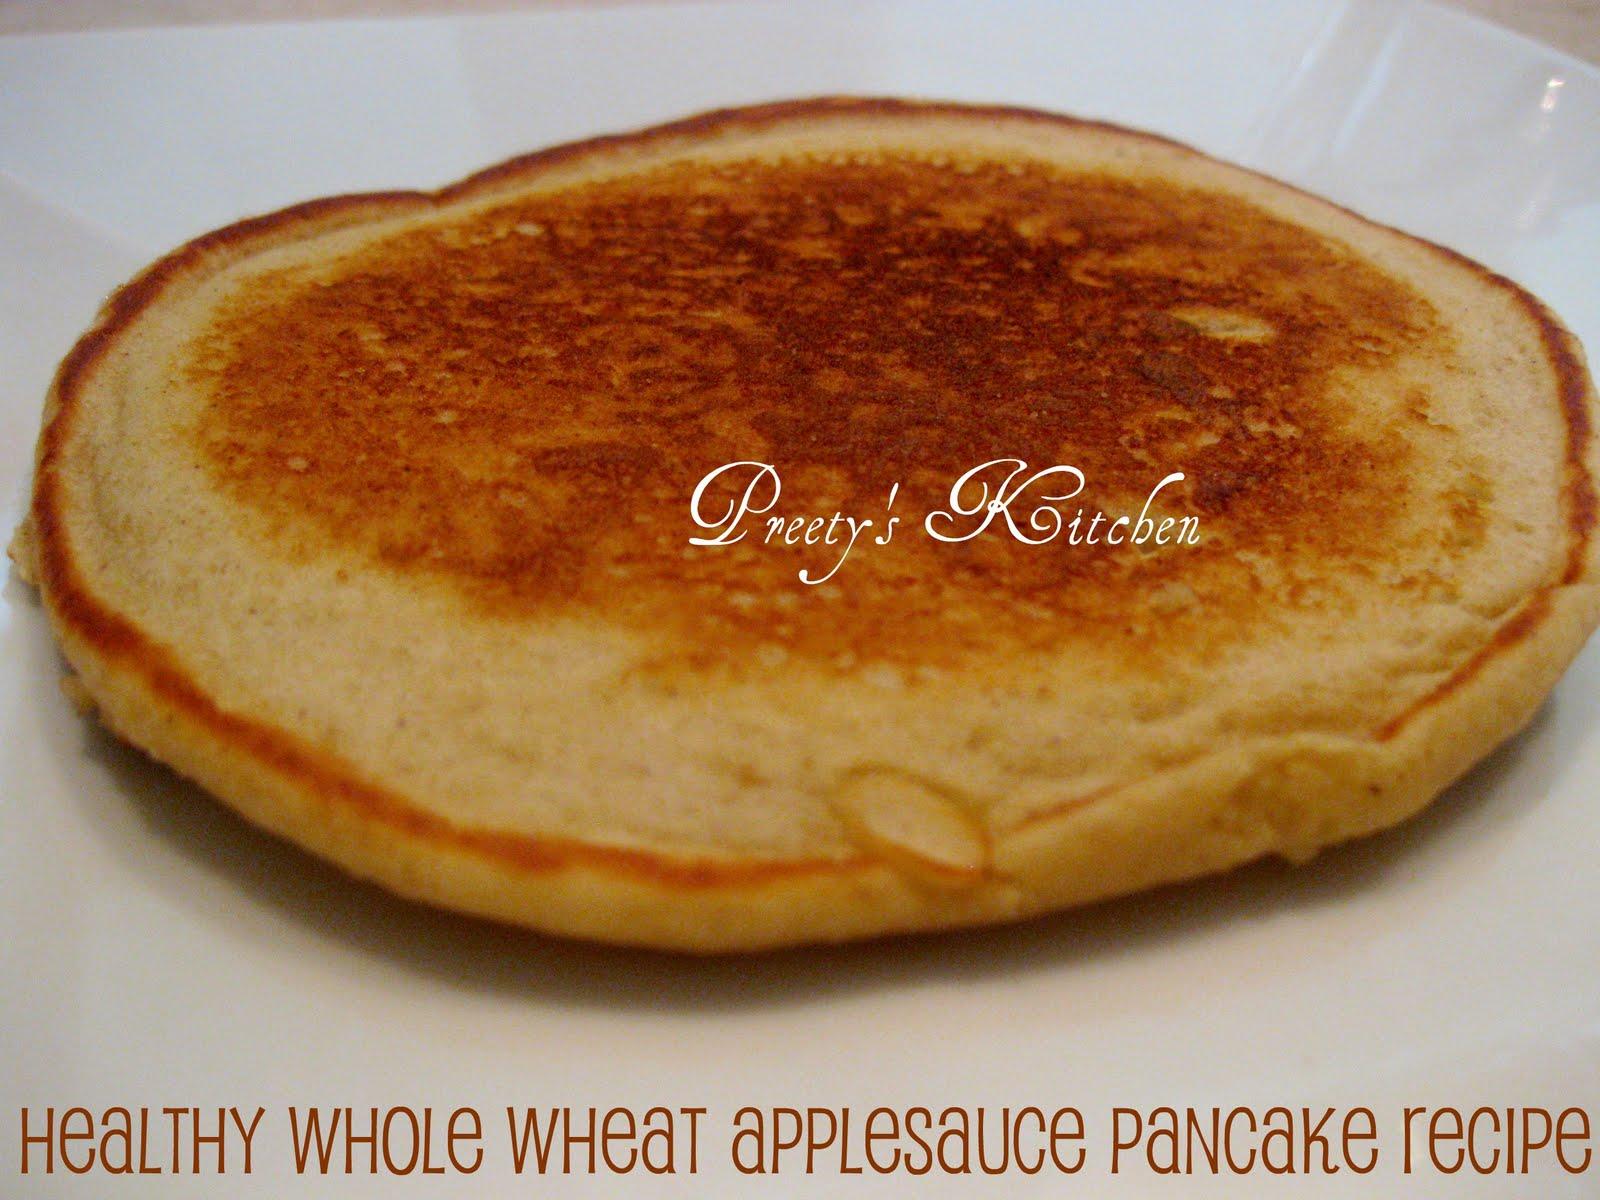 Preety's Kitchen: Healthy Whole Wheat Applesauce Pancake ...